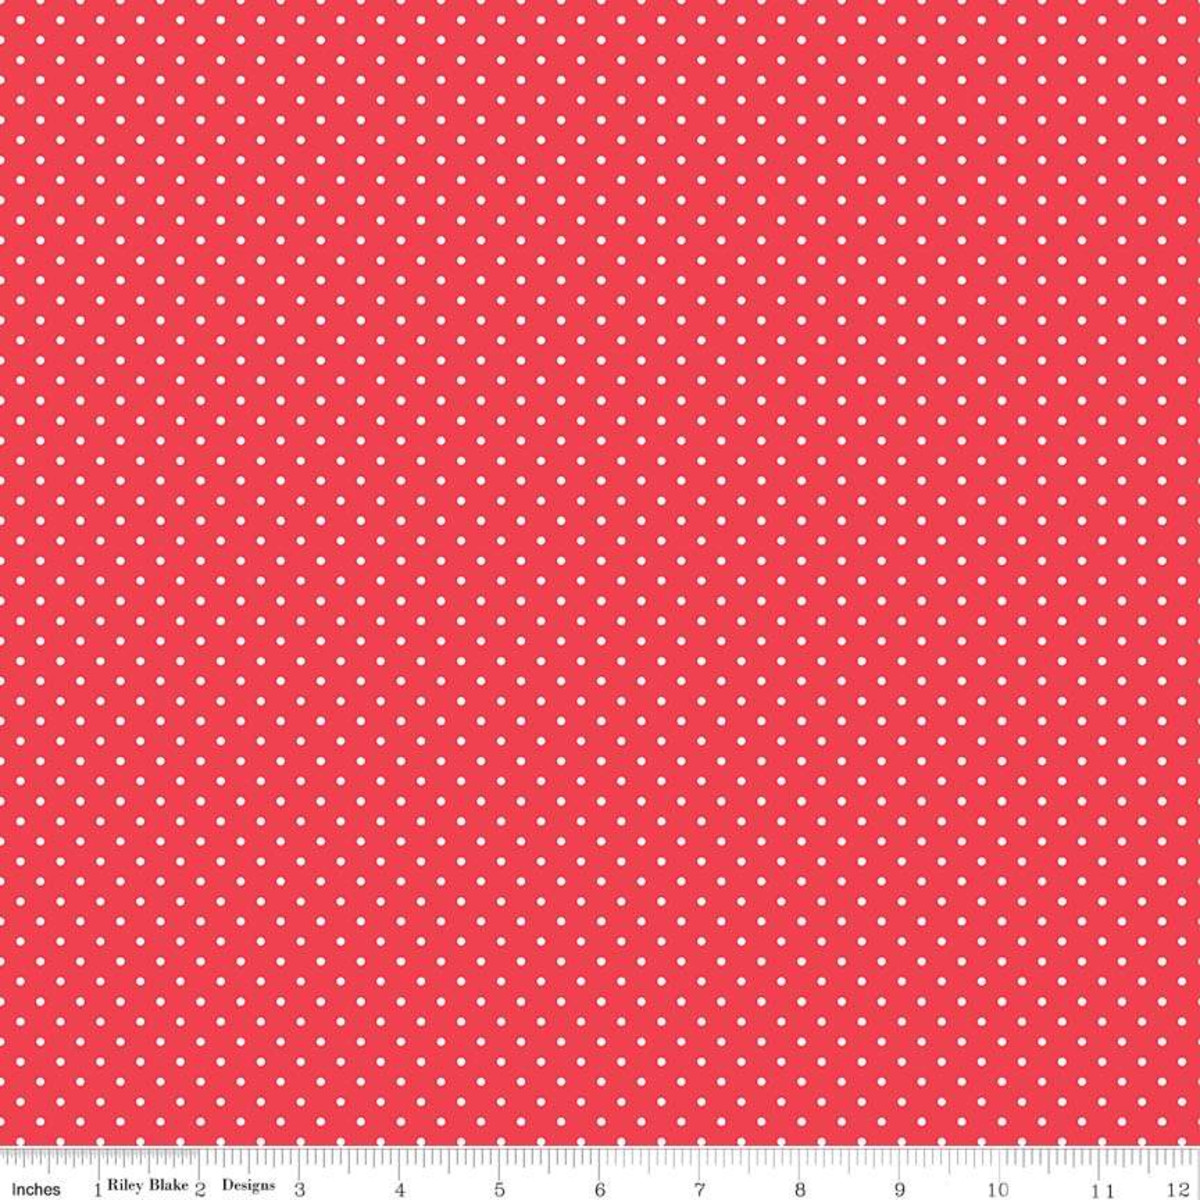 Swiss dot - cayenne